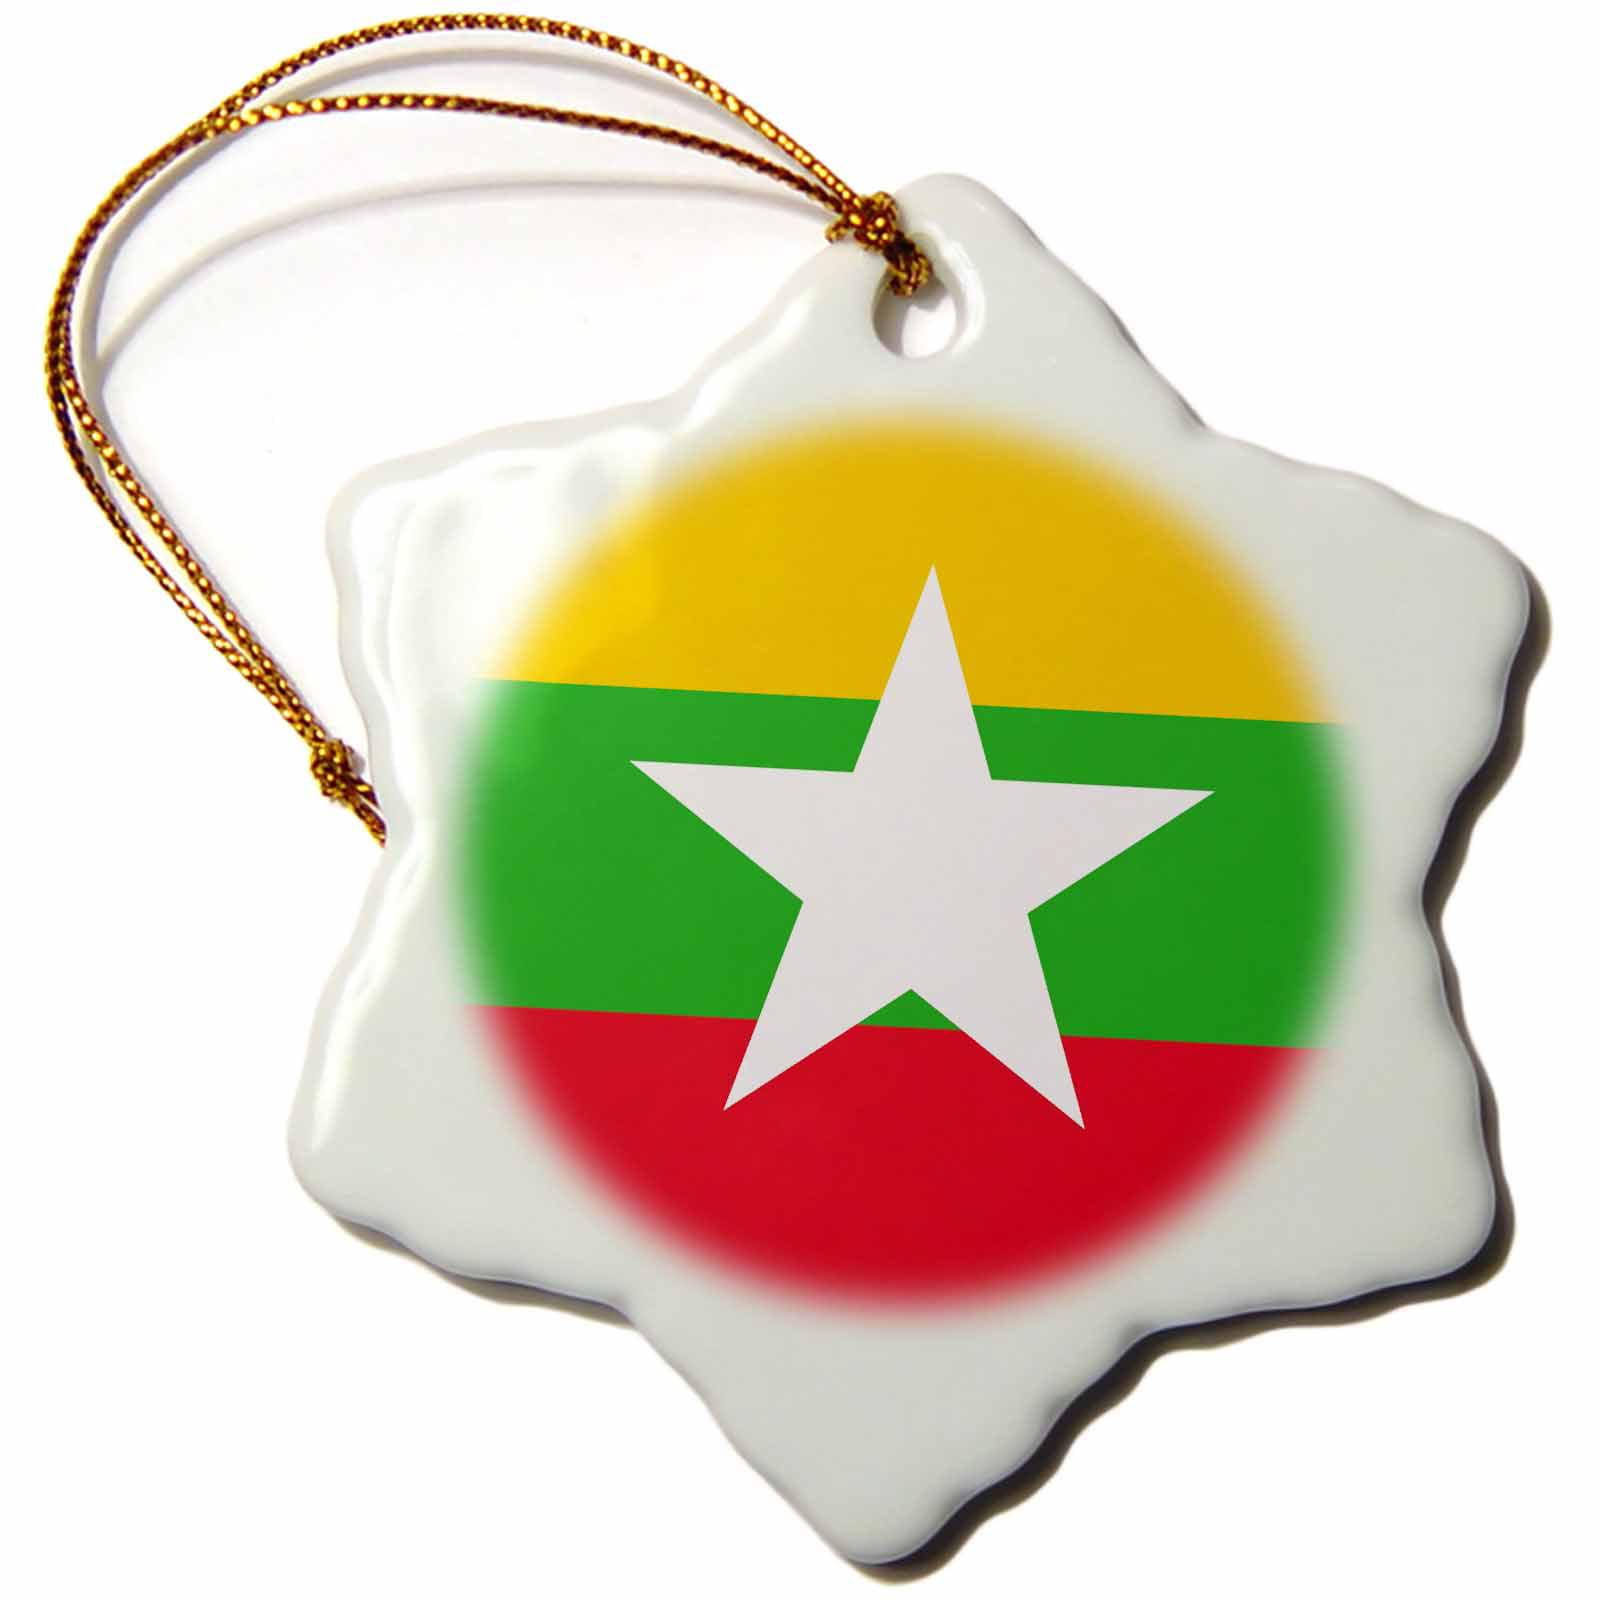 3drose Flag Of Myanmar Burma Burmese Yellow Green Red Stripes With